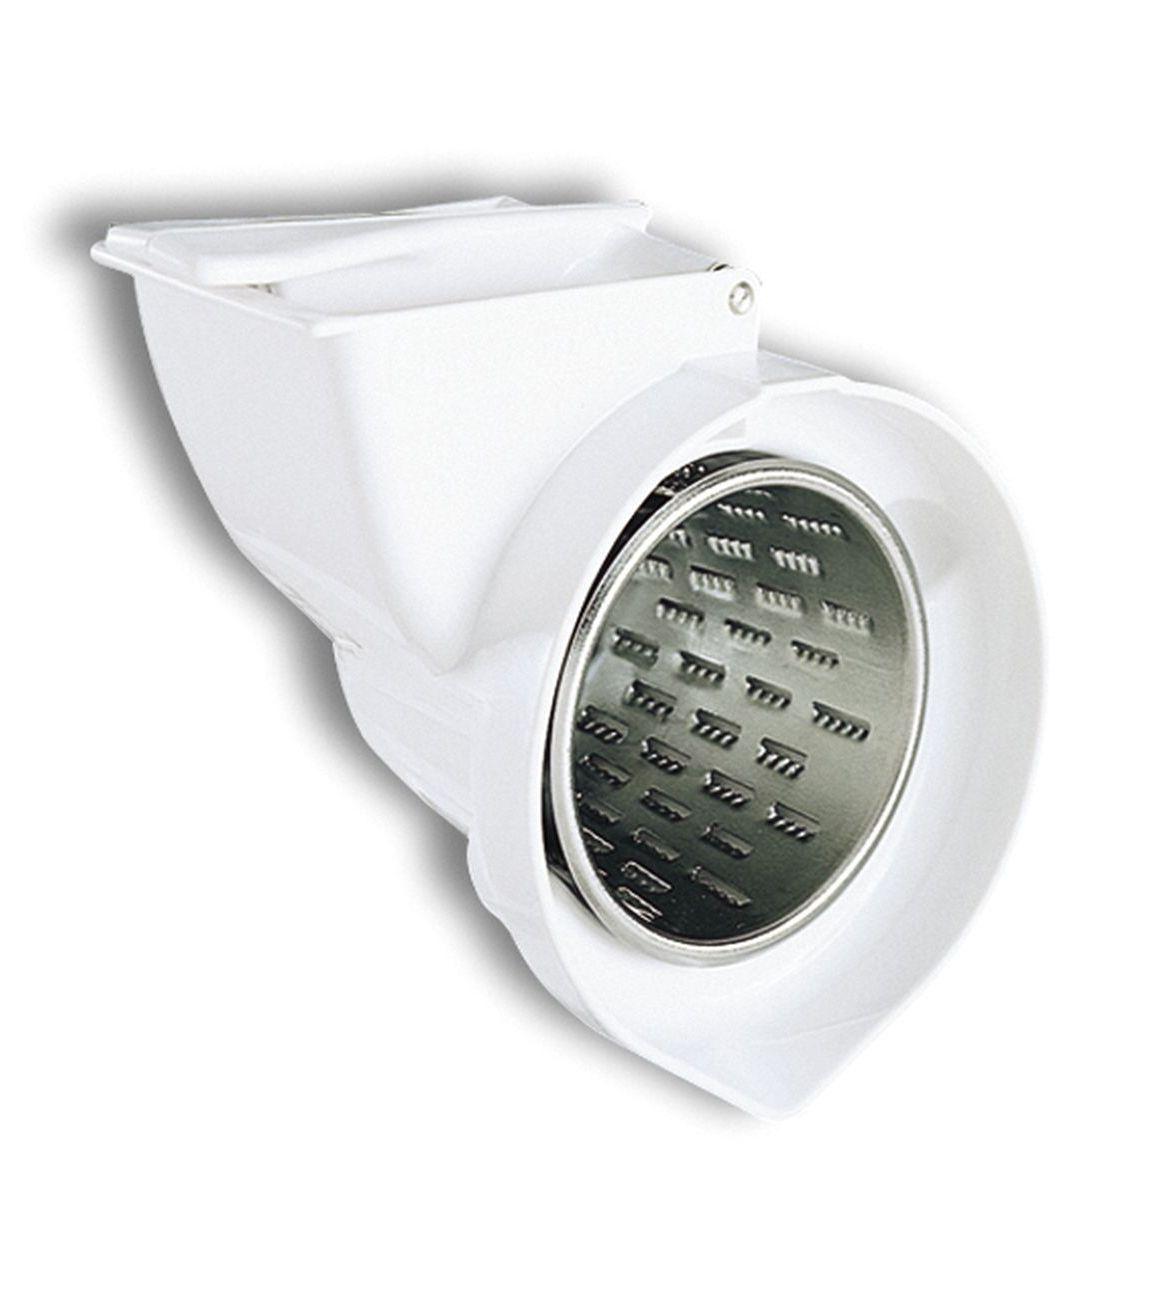 Kitchenaid Rotor Slicer W Shredder Attachment For Ka